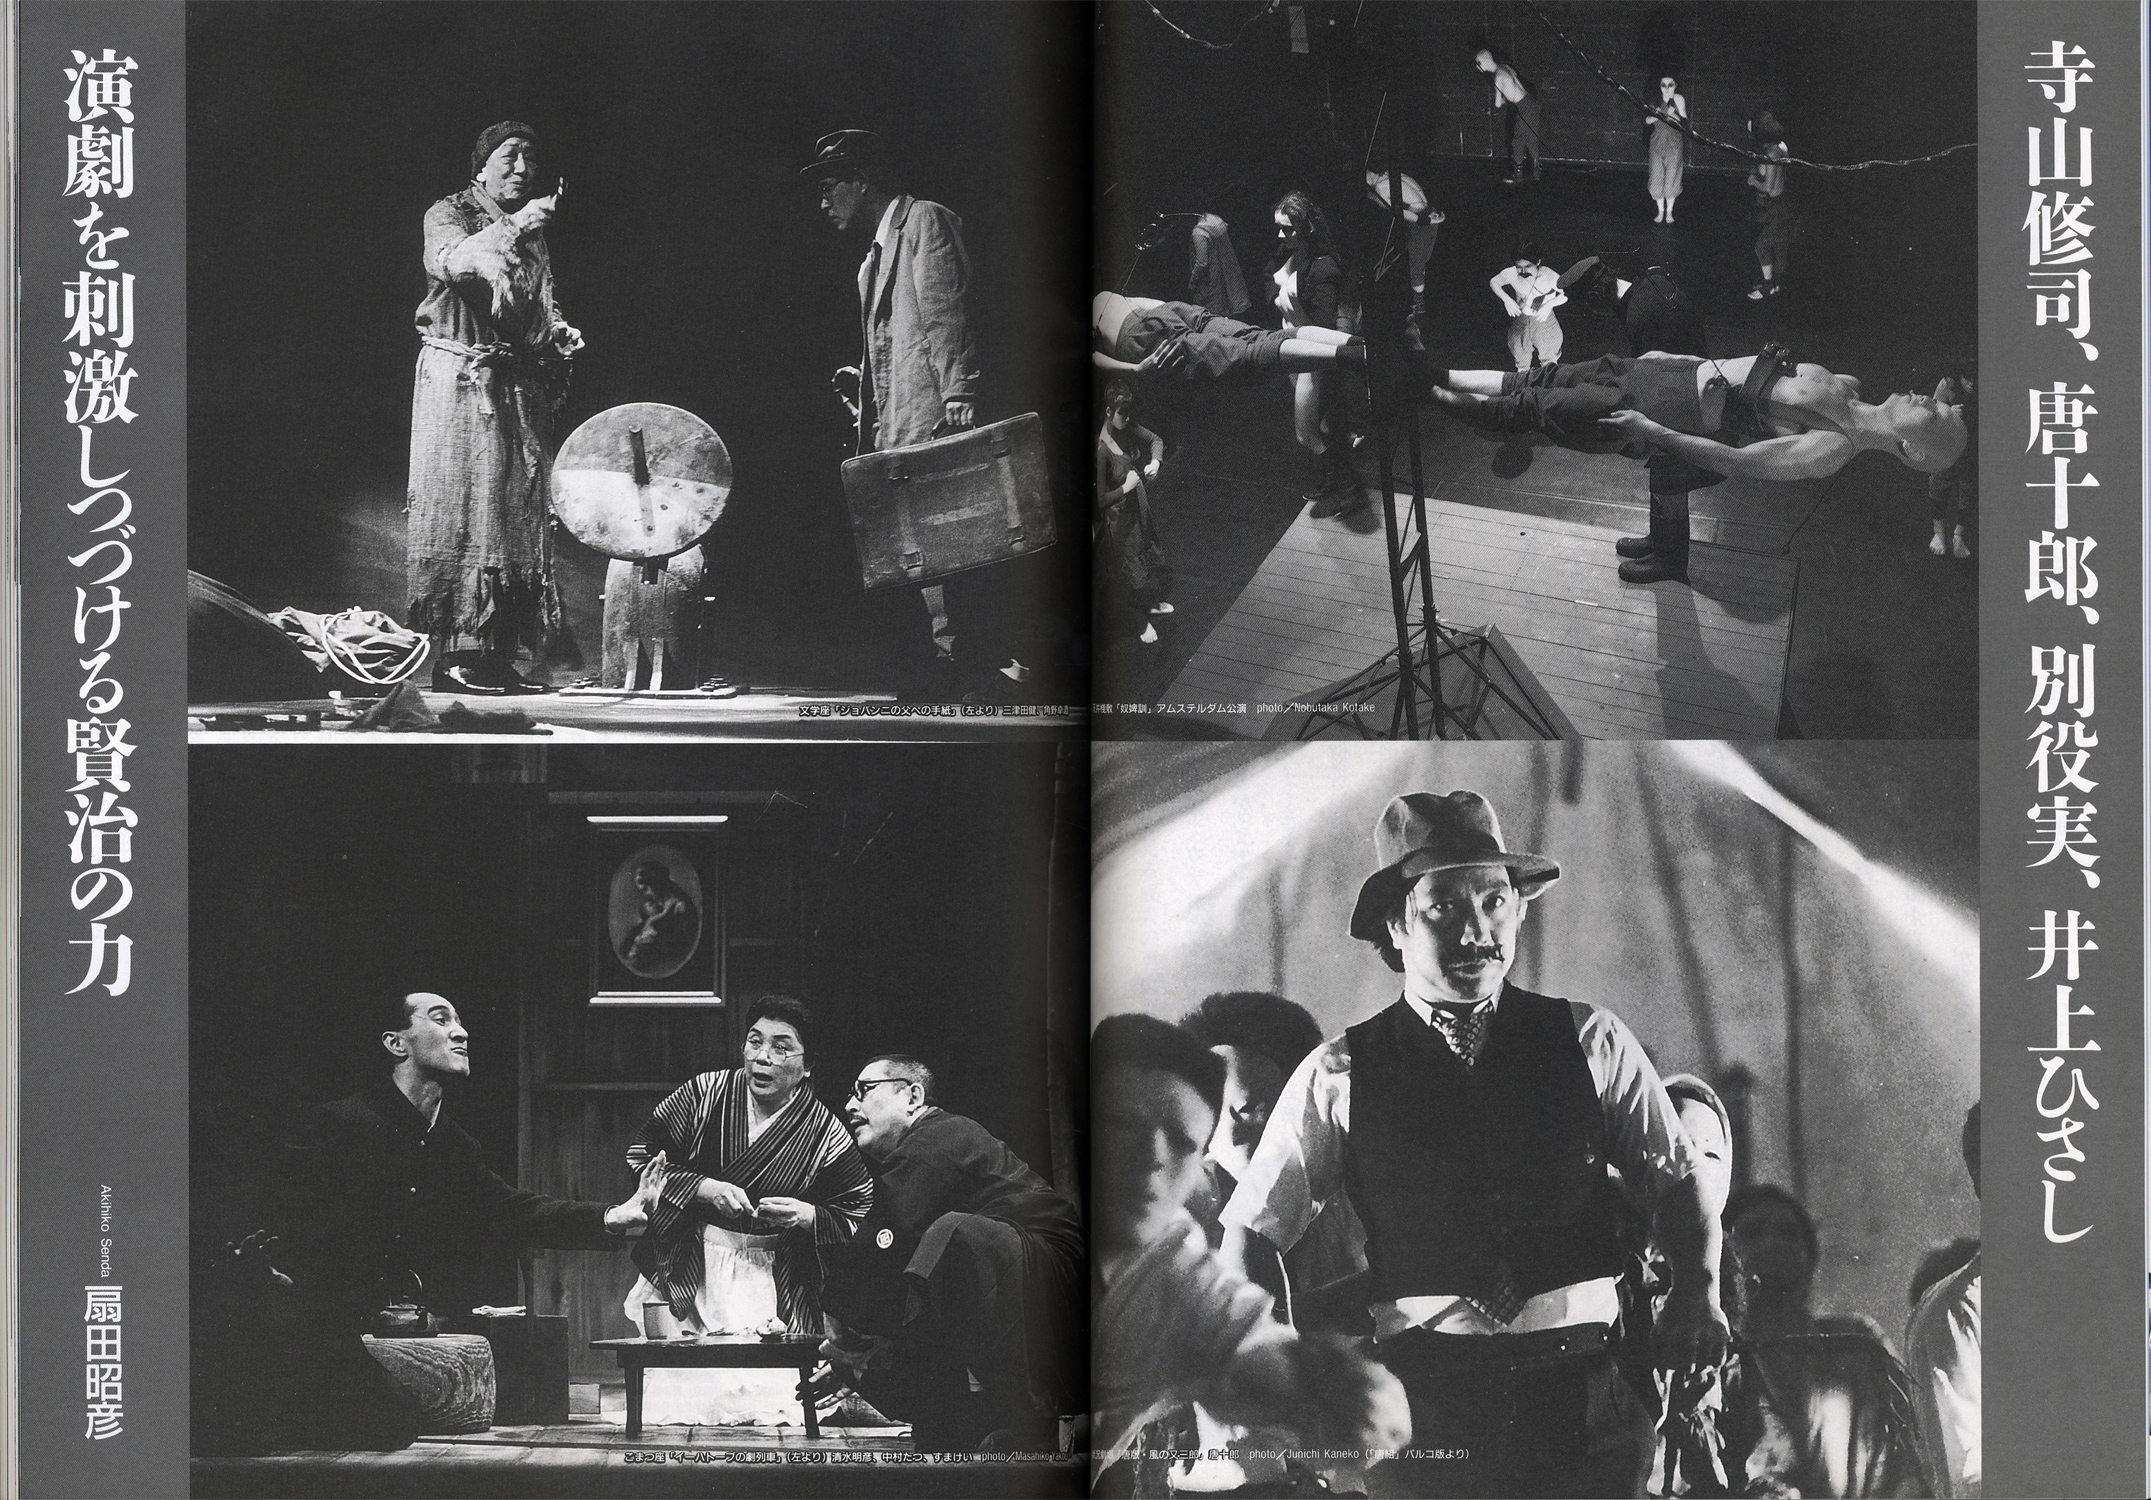 Art EXPRESS 季刊アート・エクスプレス No.4 1994 AUTUMN[image2]